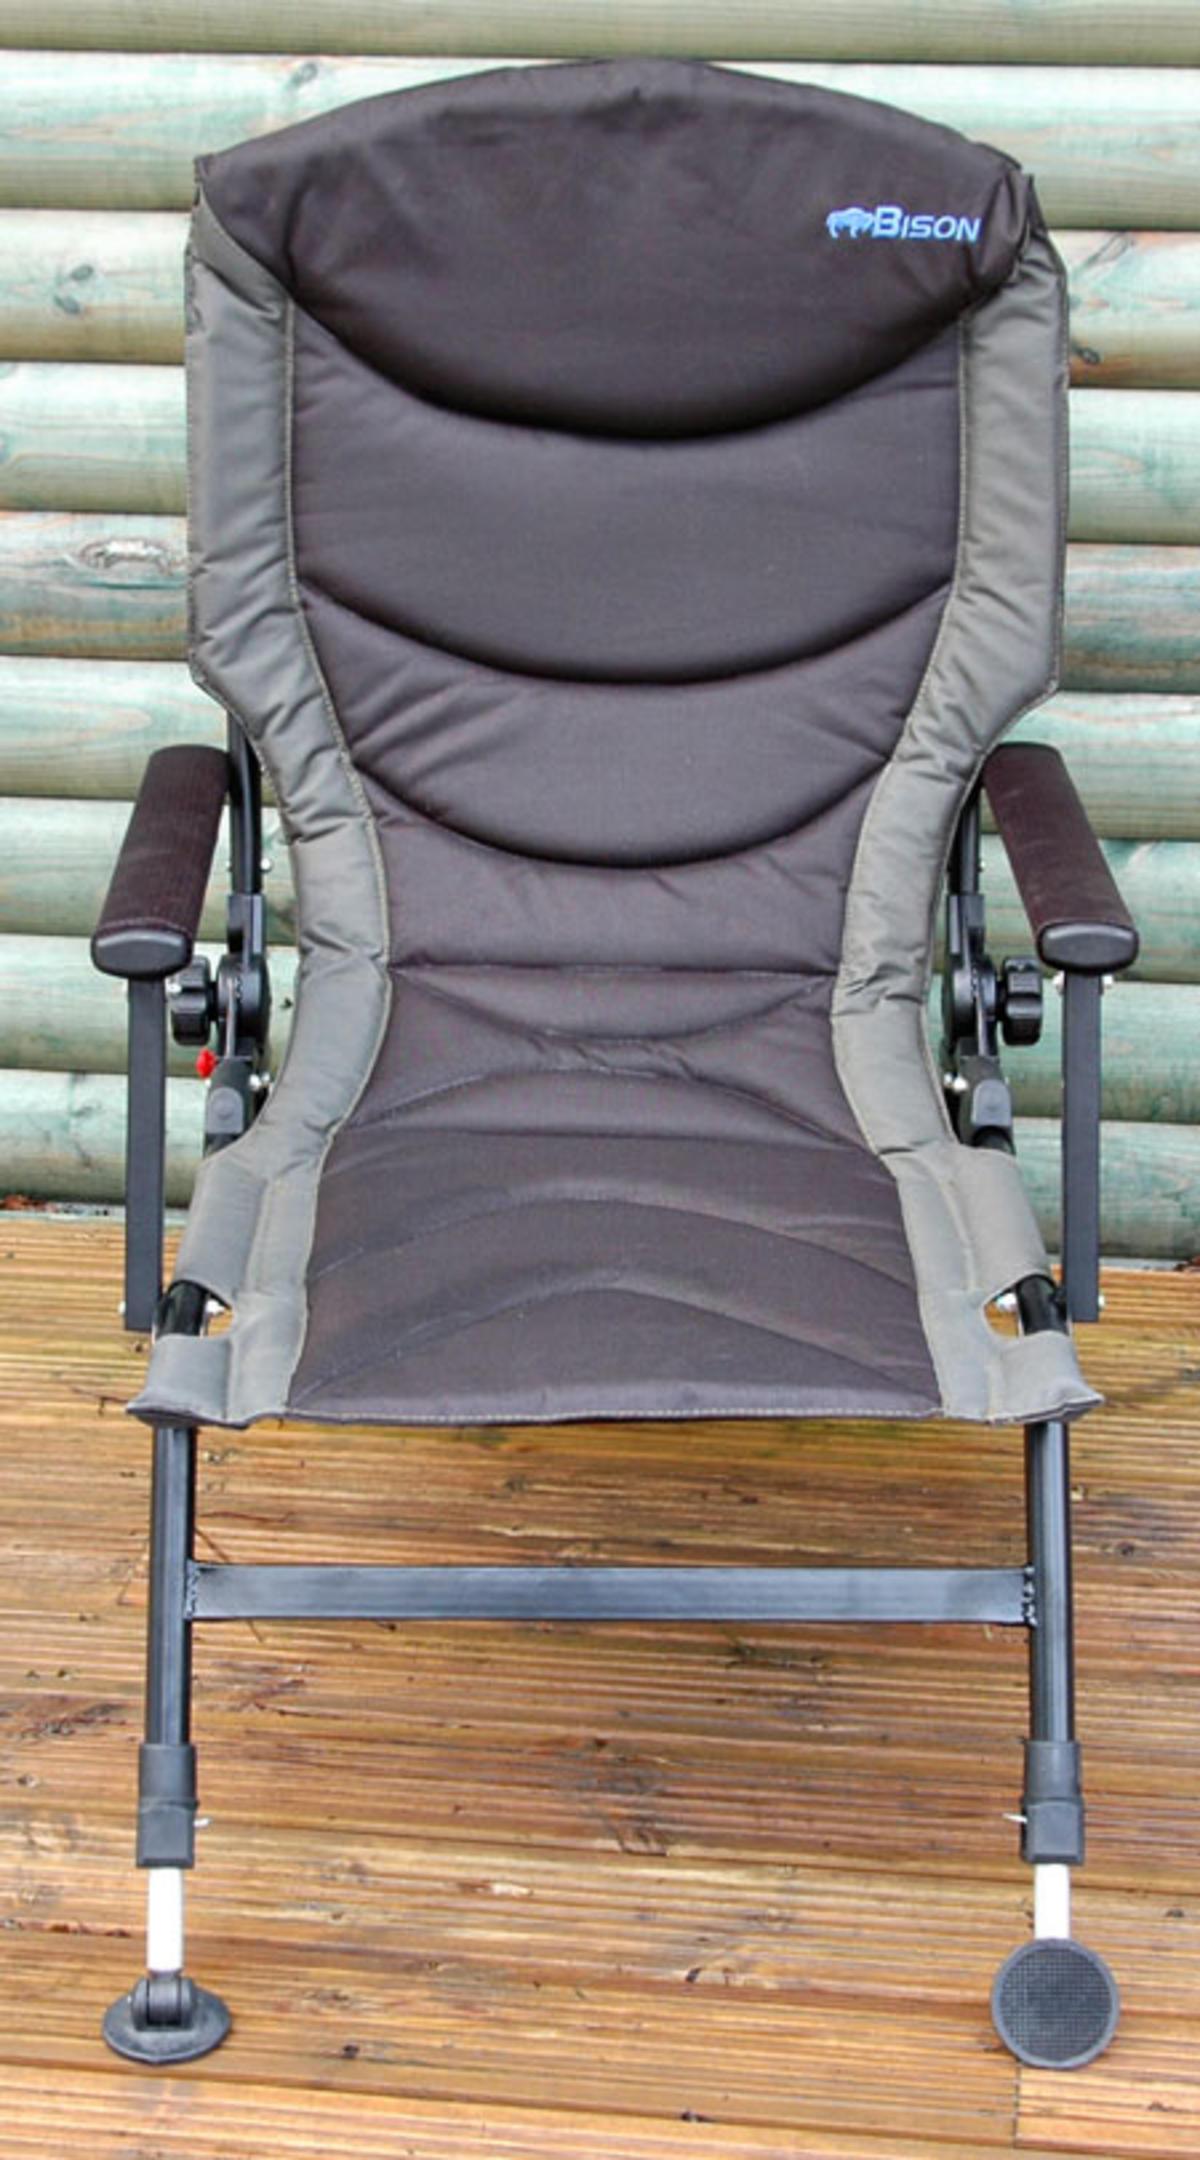 Bison Delux Carp Chair Adjustable Legs Back Recliner